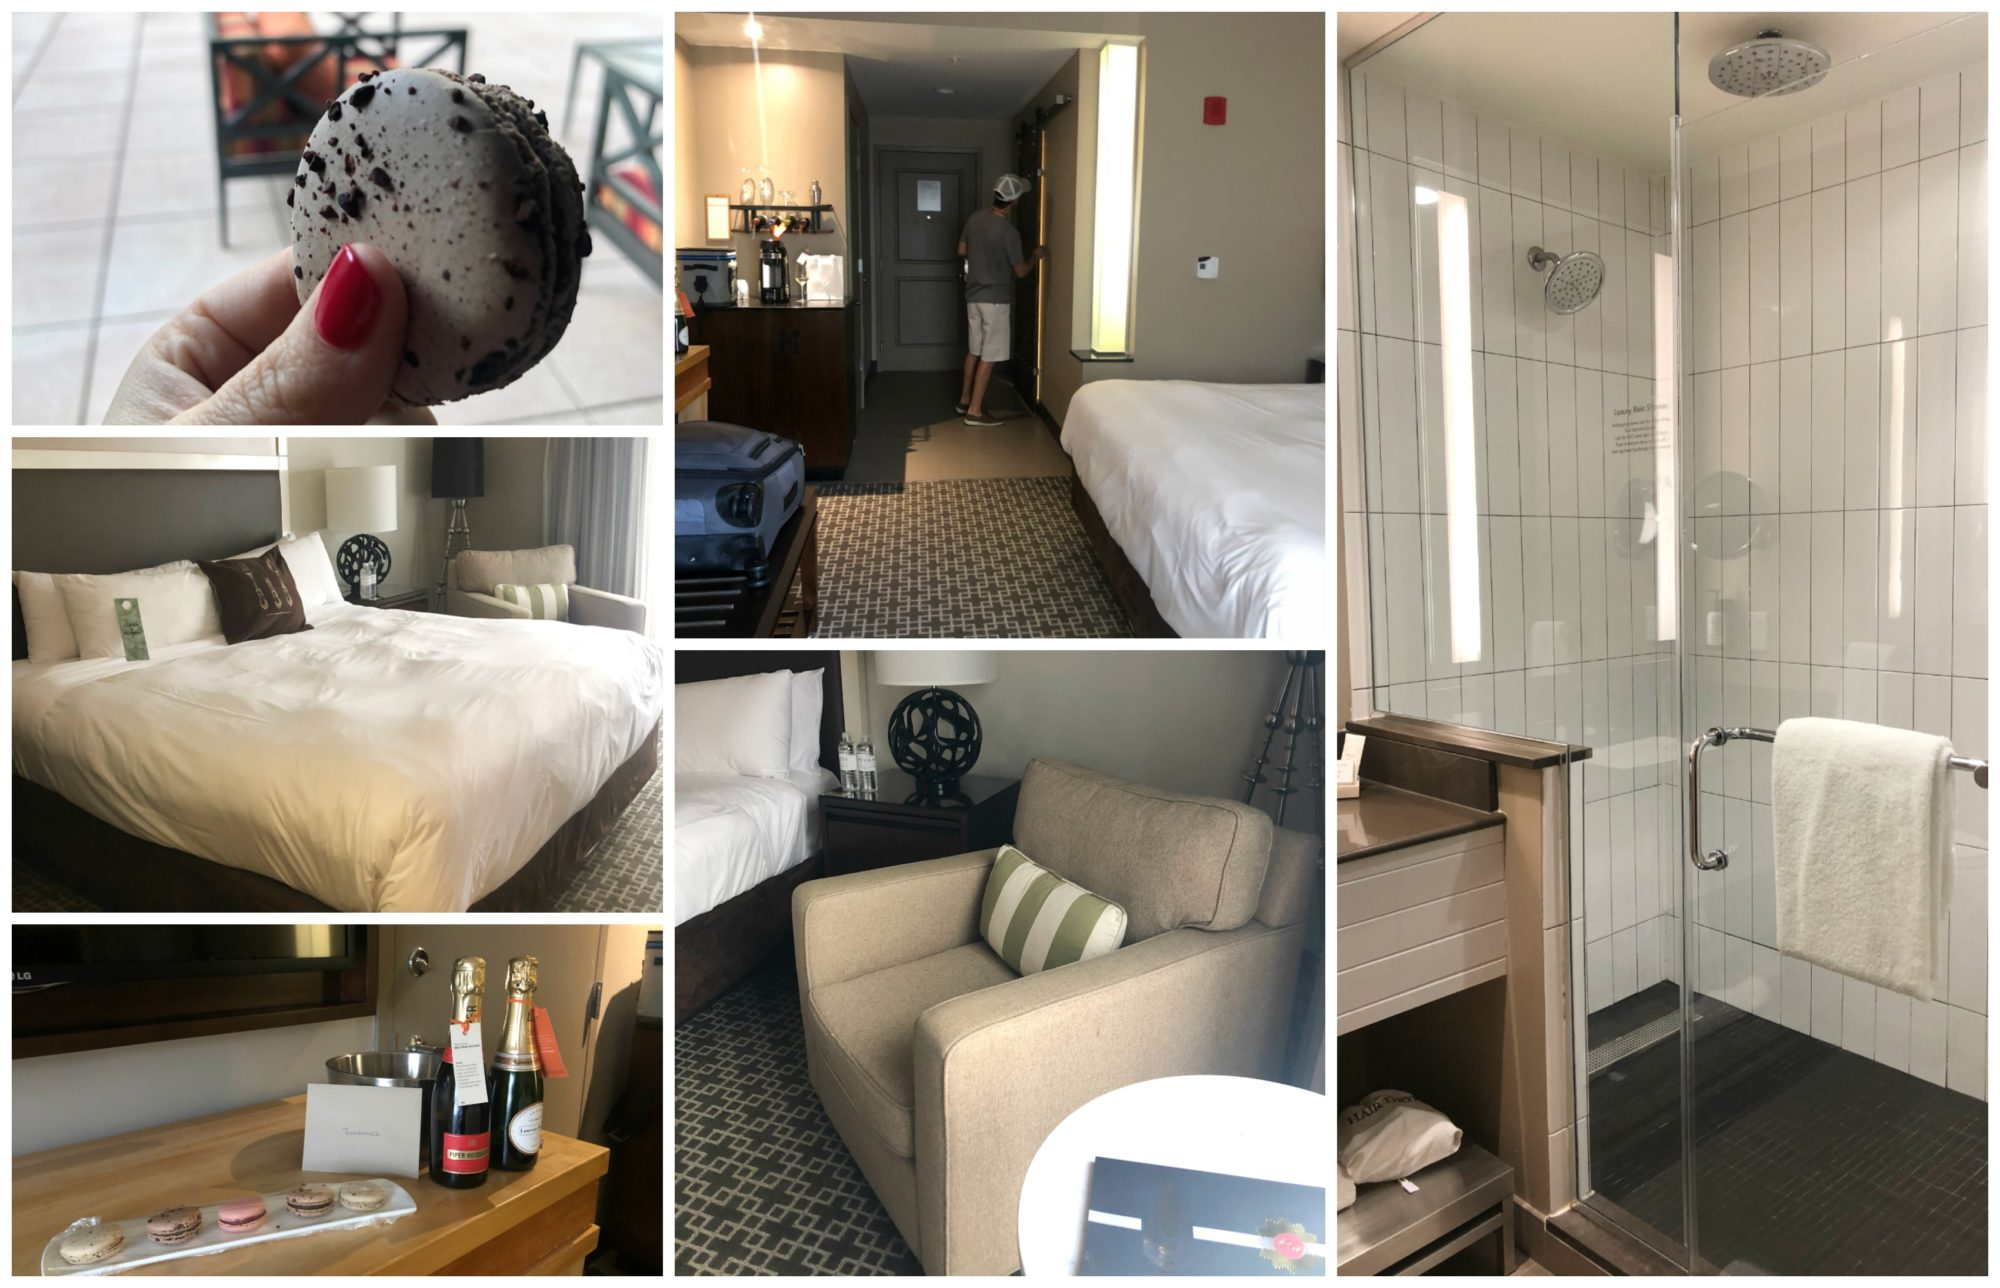 The Epicureran Hotel - Hotel Room